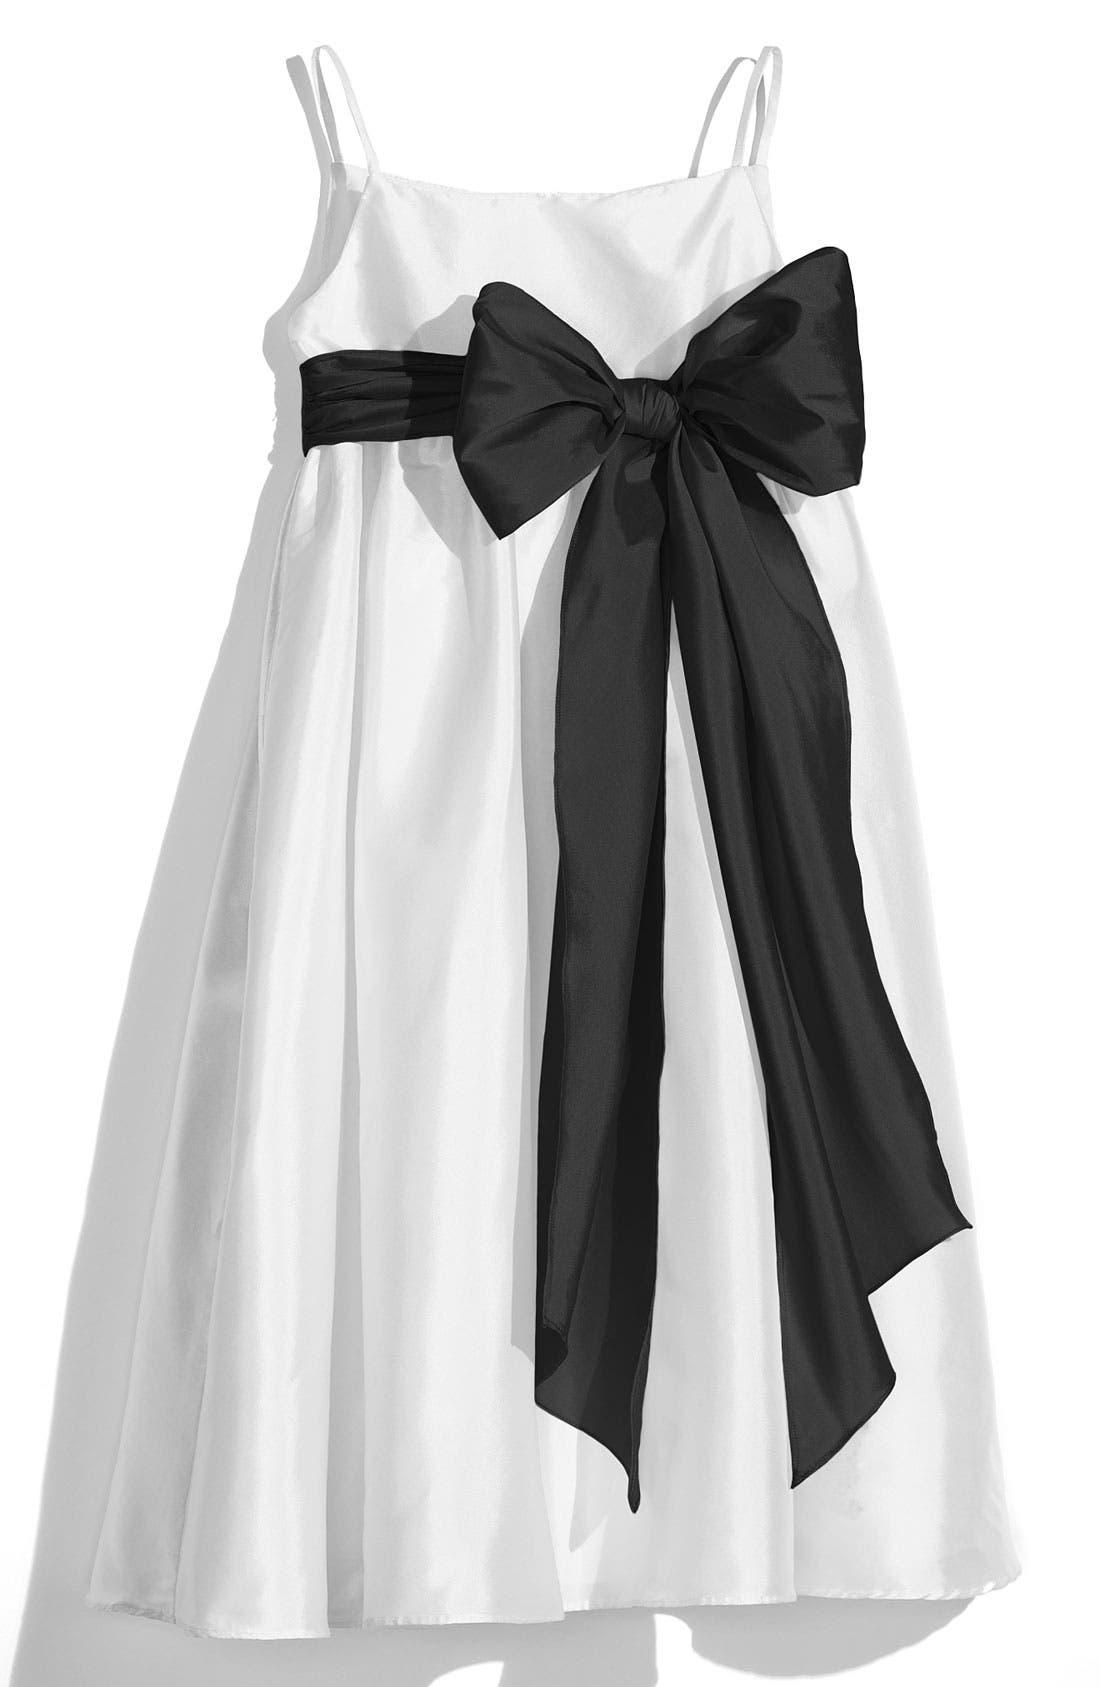 White Sleeveless Empire Waist Taffeta Dress,                             Main thumbnail 1, color,                             001